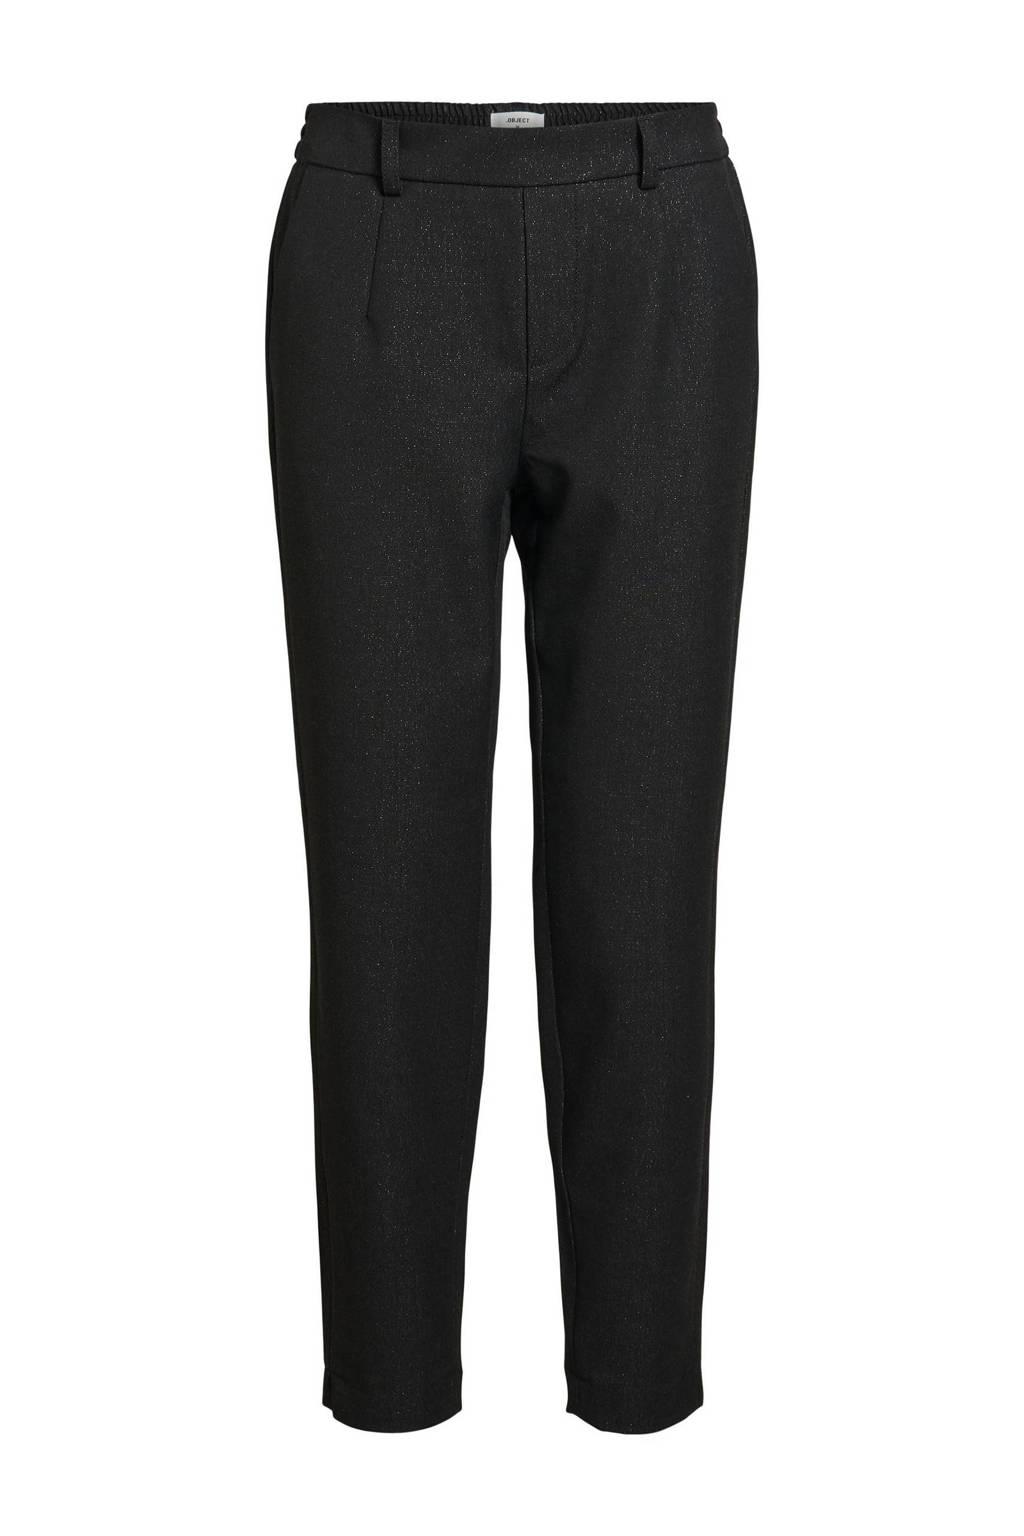 OBJECT tapered fit pantalon OBJLISA van gerecycled polyester zwart, Zwart